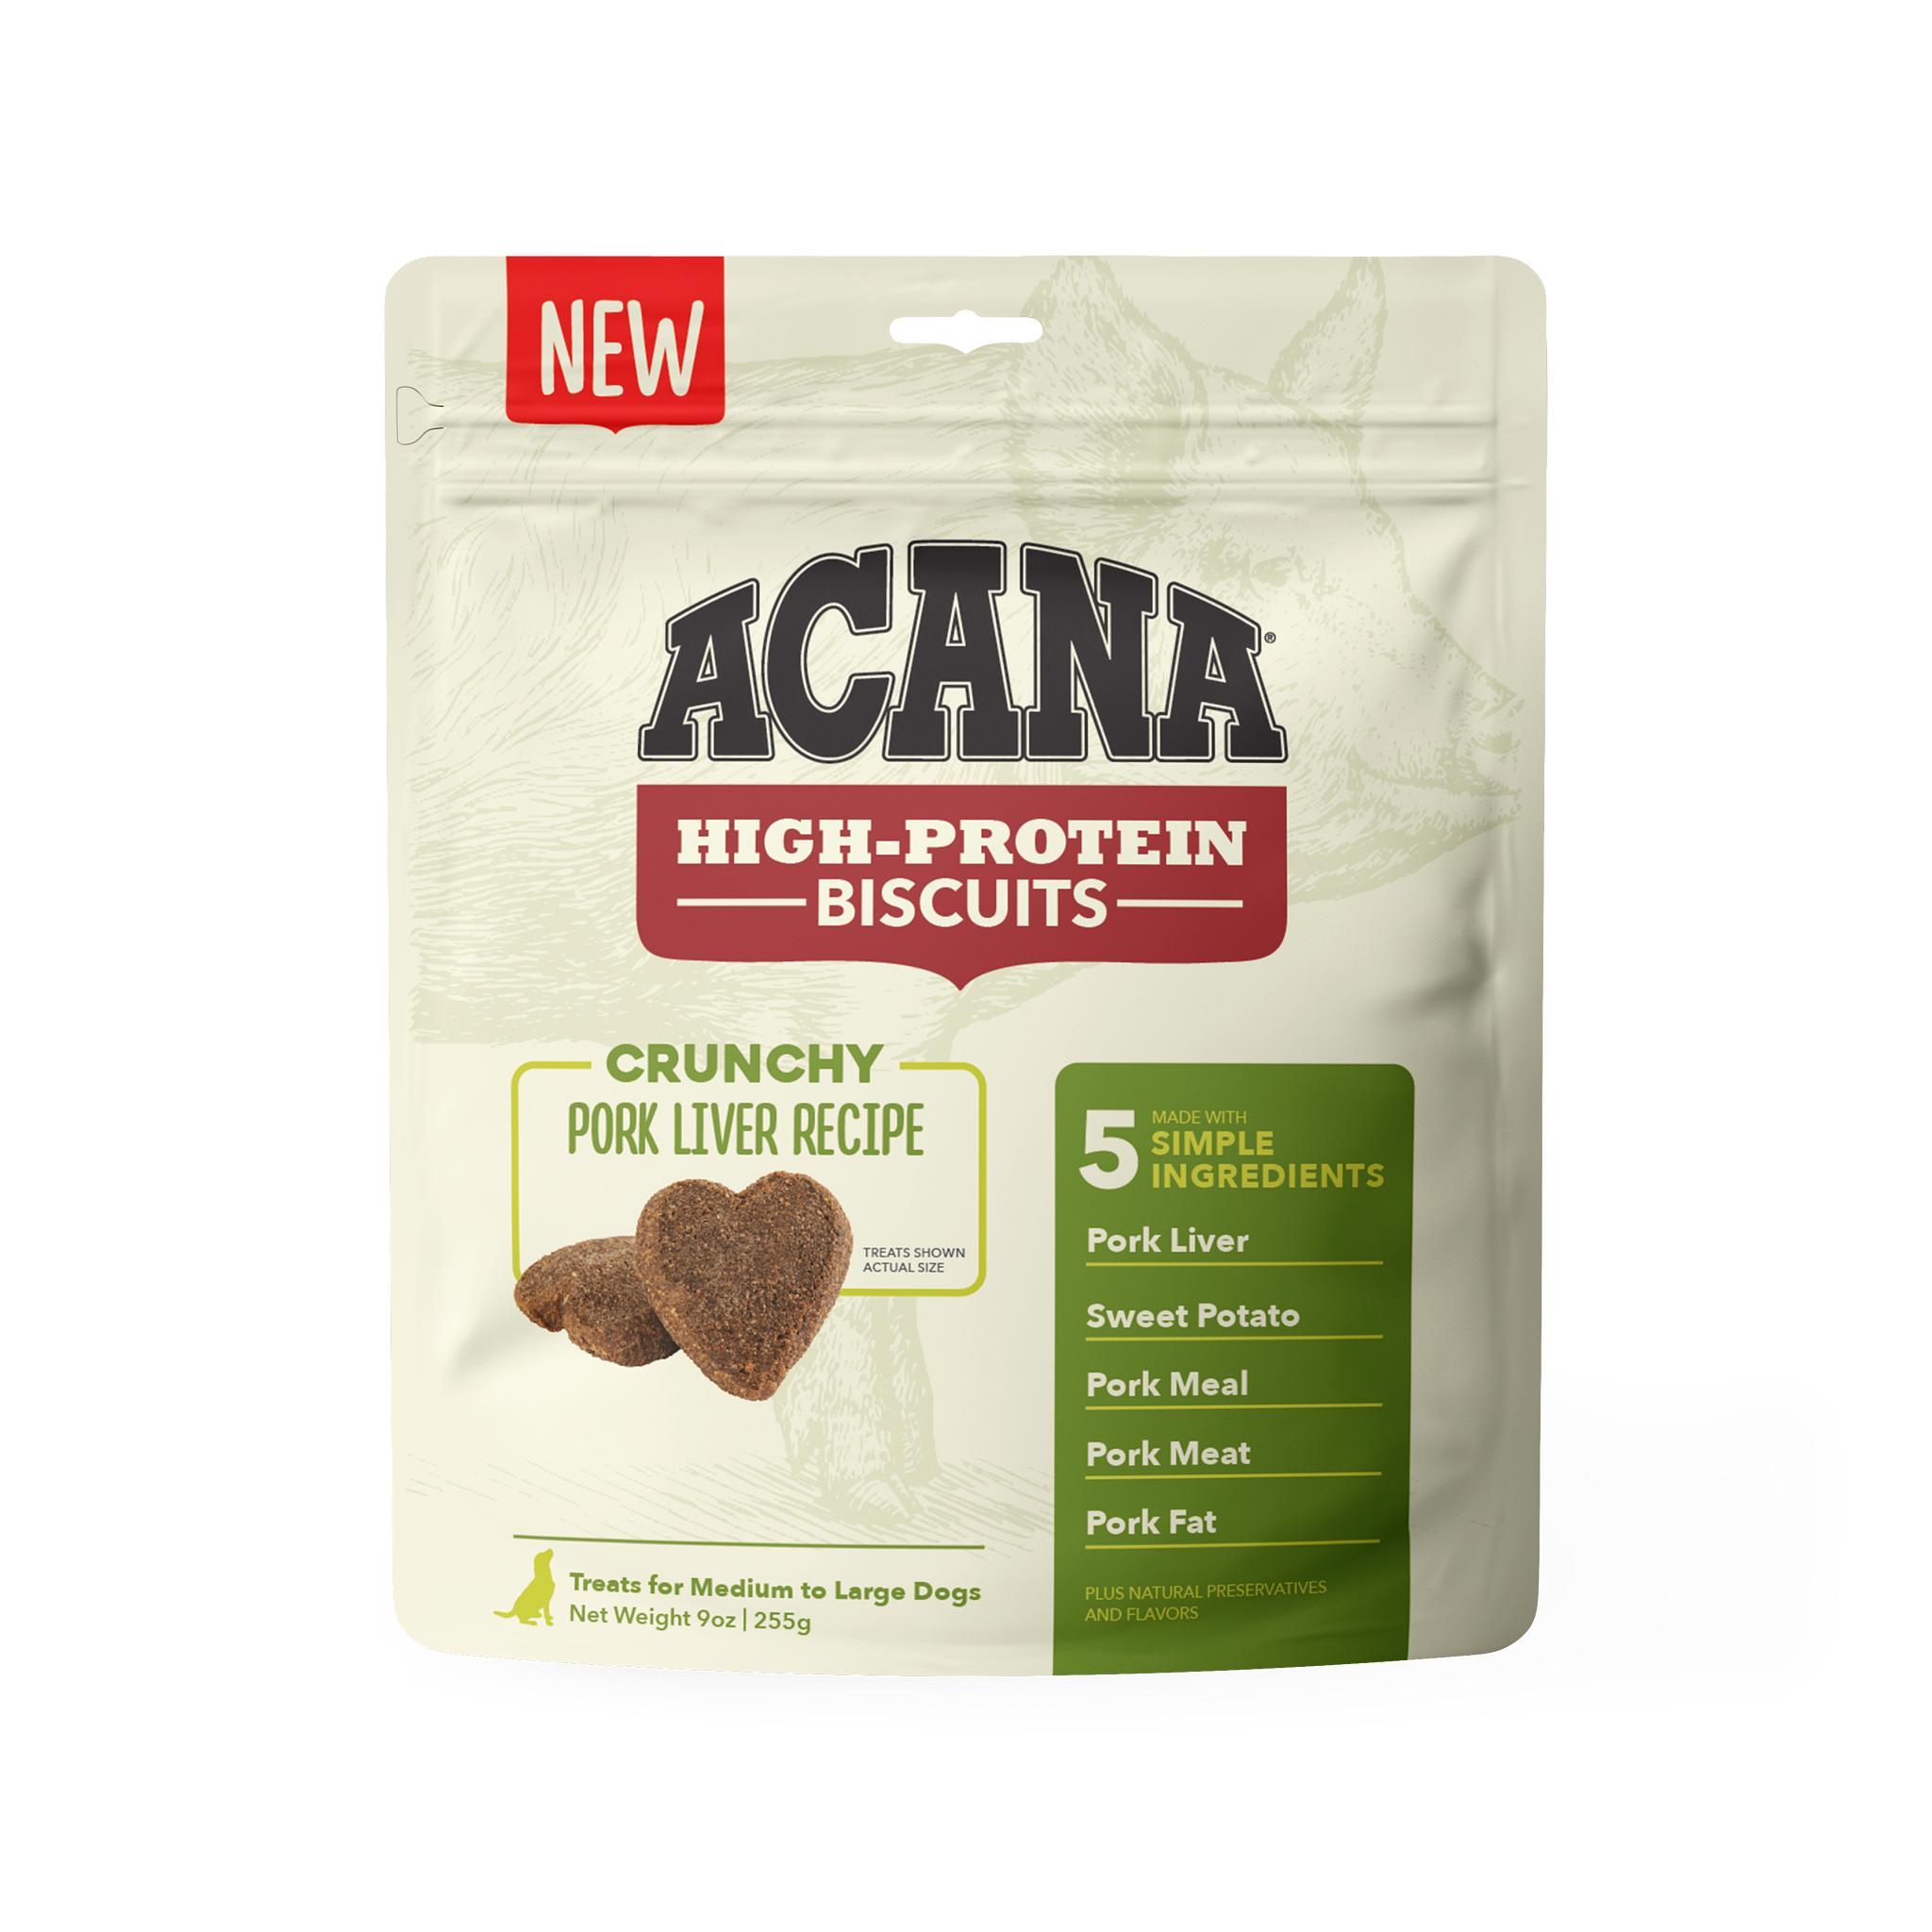 ACANA Crunchy Biscuits Pork Liver Recipe Dog Treats, Large